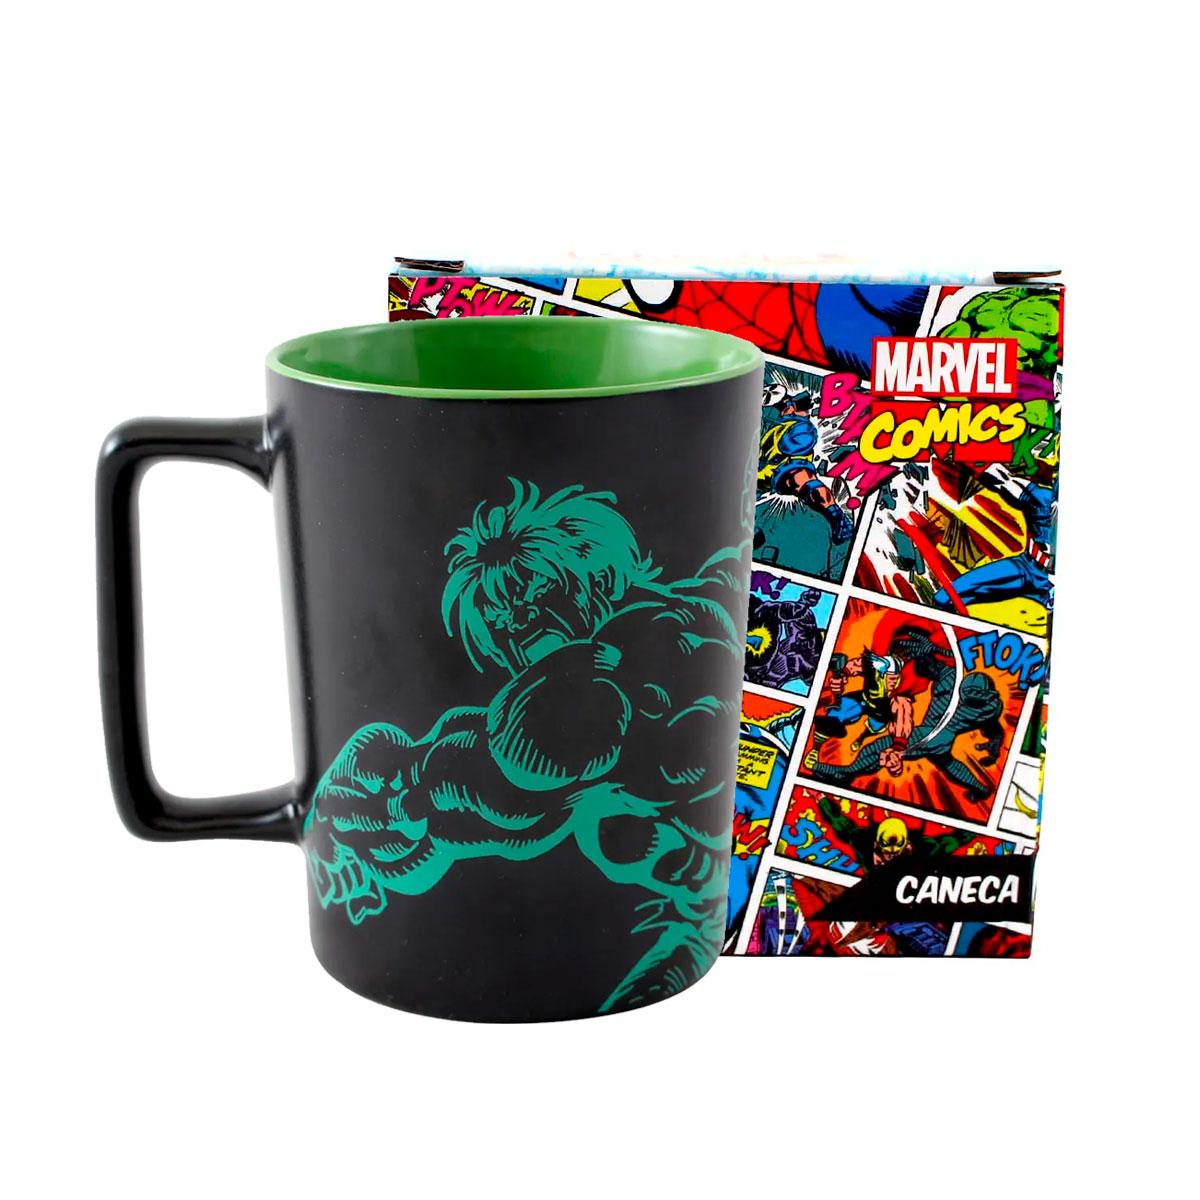 Caneca Alça Quadrada 500 ml Hulk Marvel